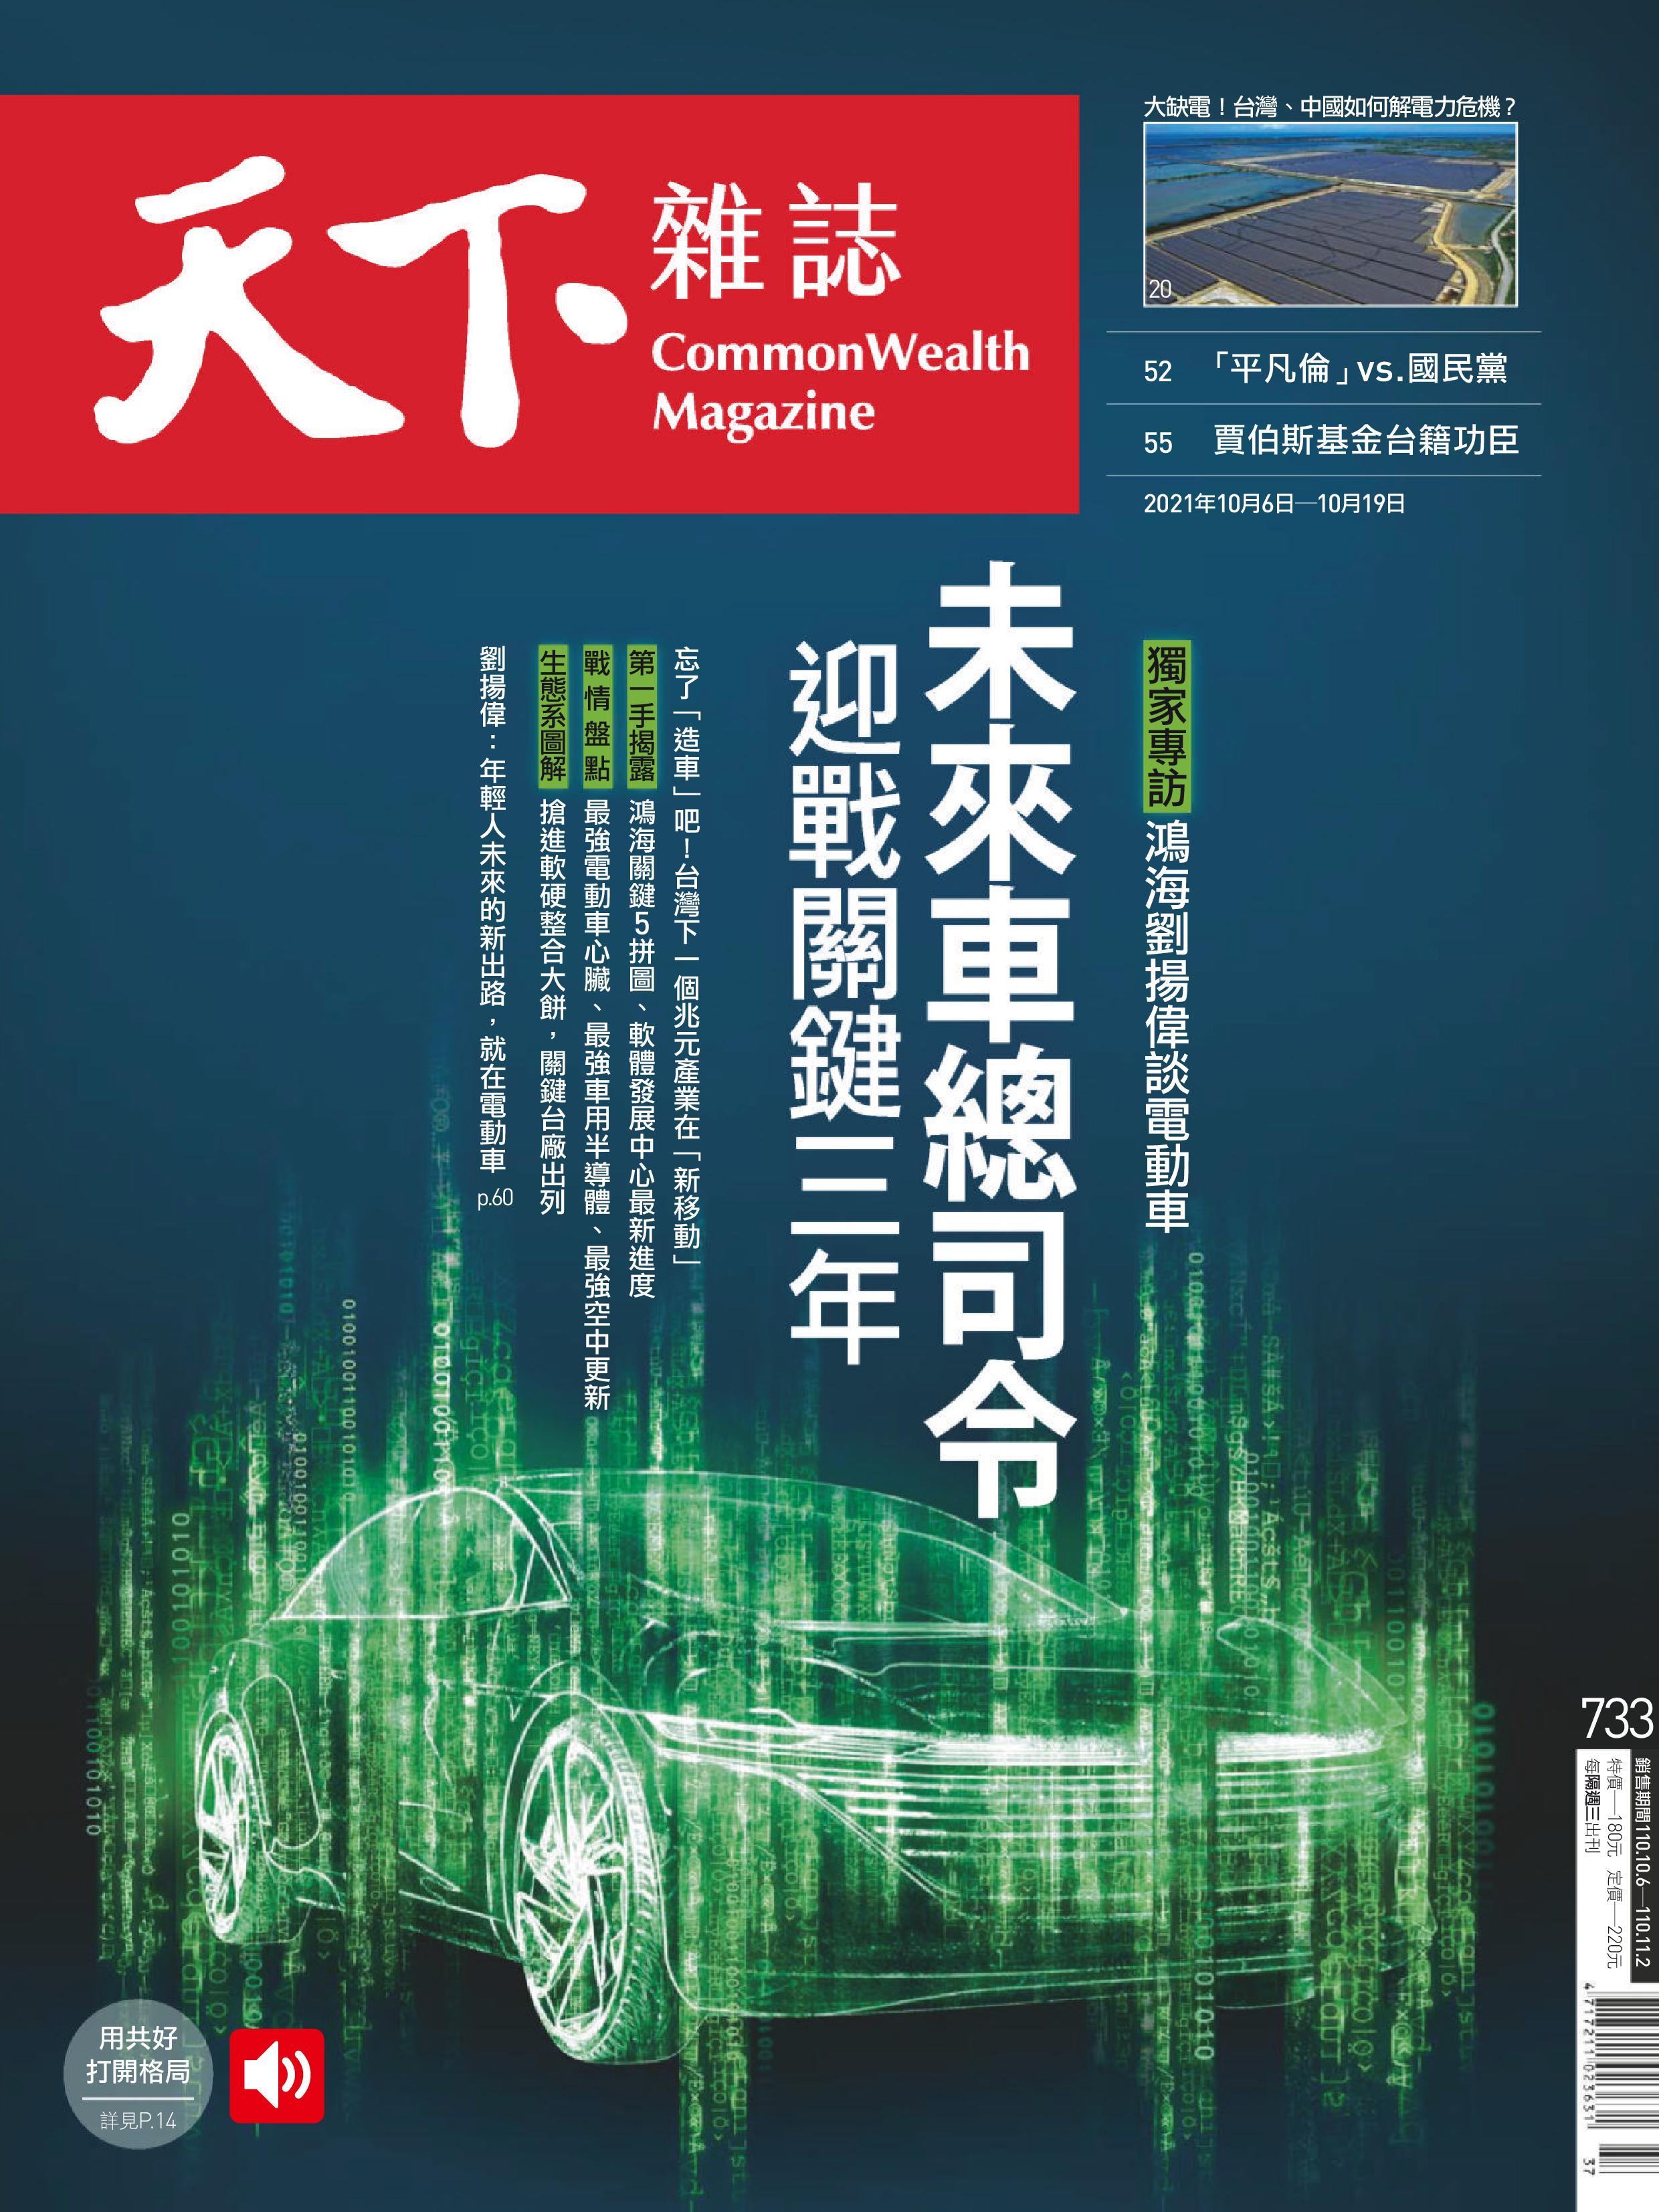 CommonWealth Magazine 天下雜誌 - 十月 06, 2021